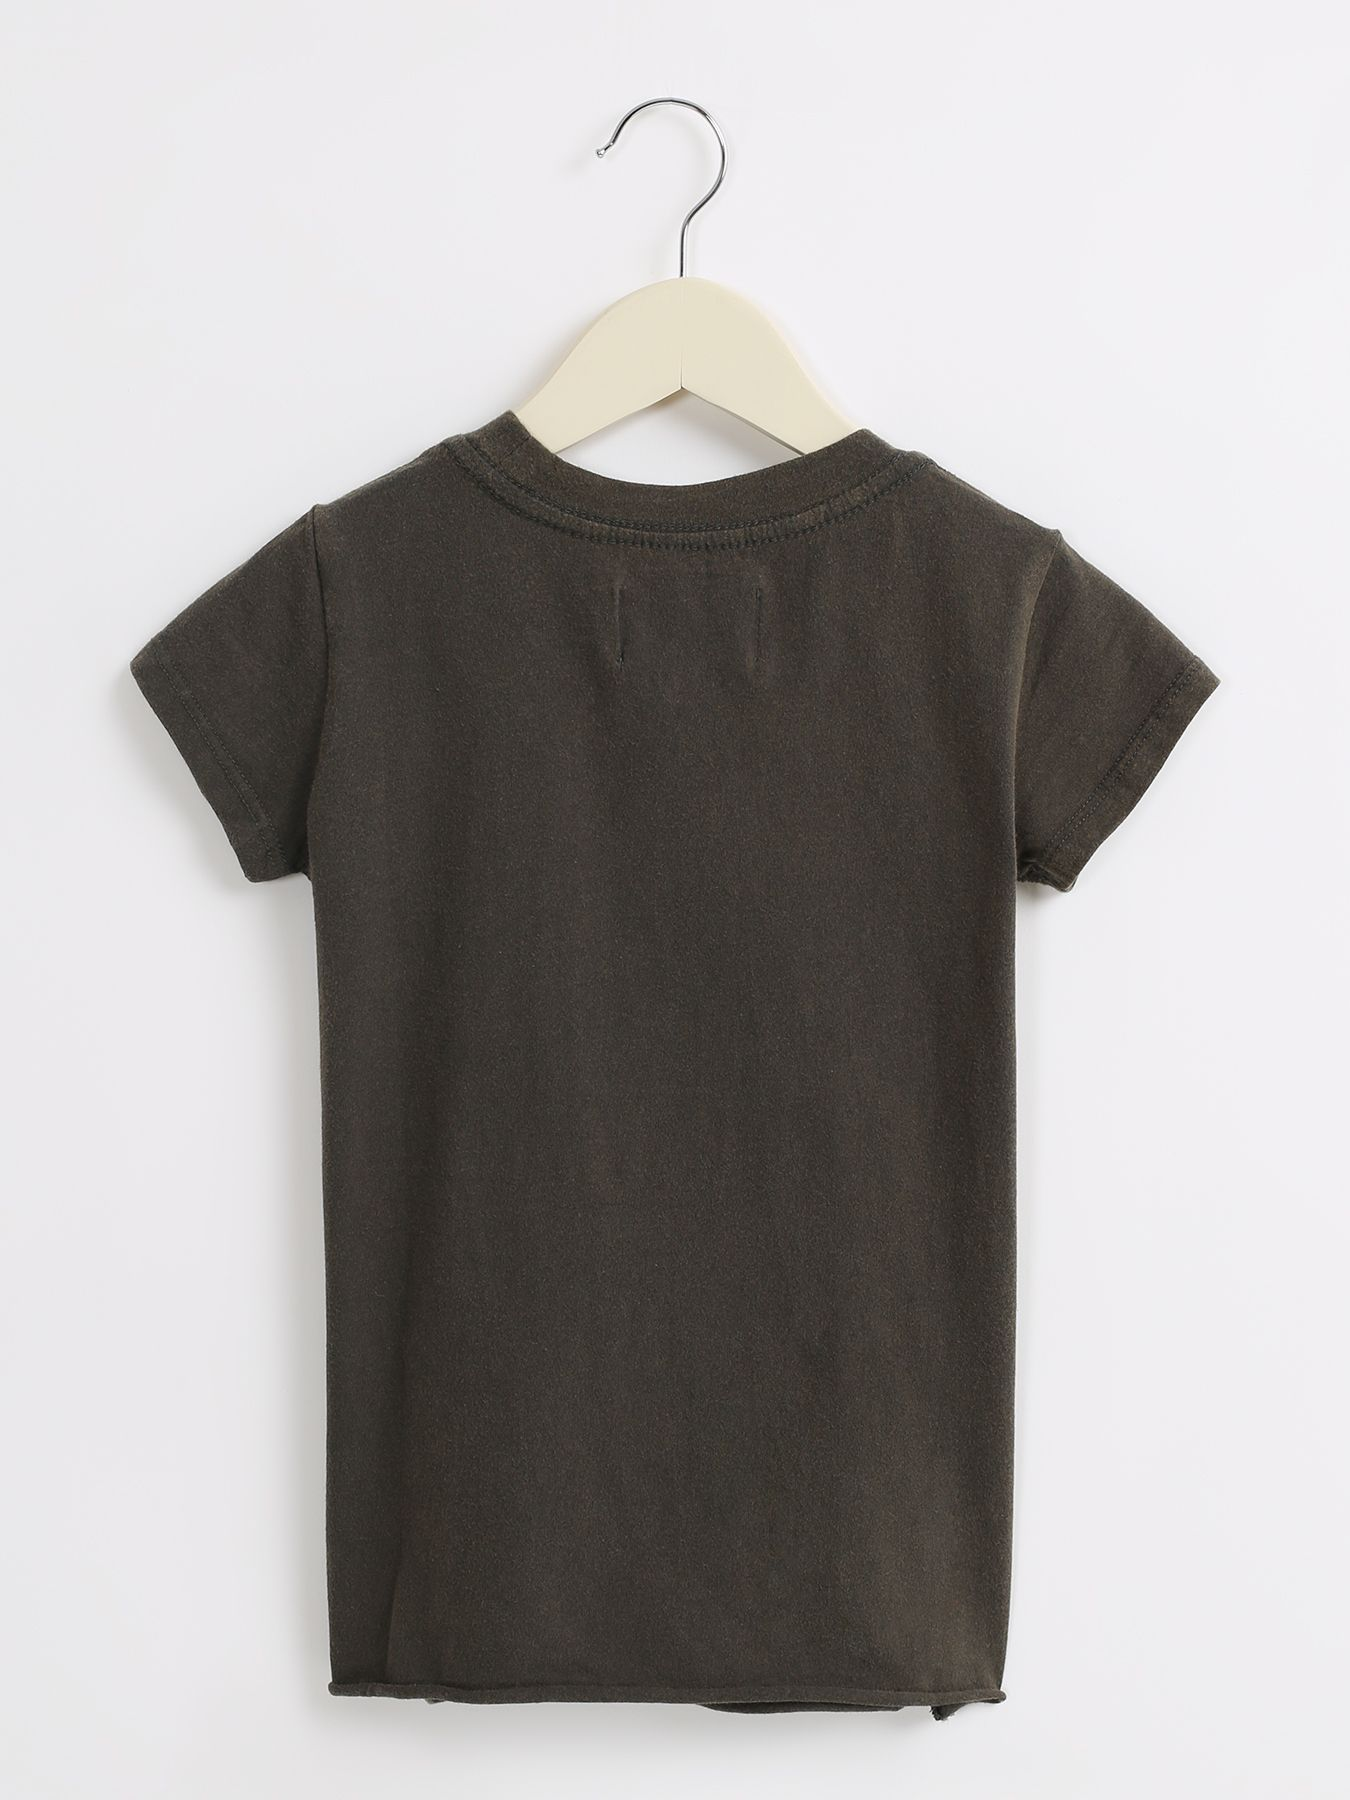 Finisterre Force Хлопковая футболка с принтом фото